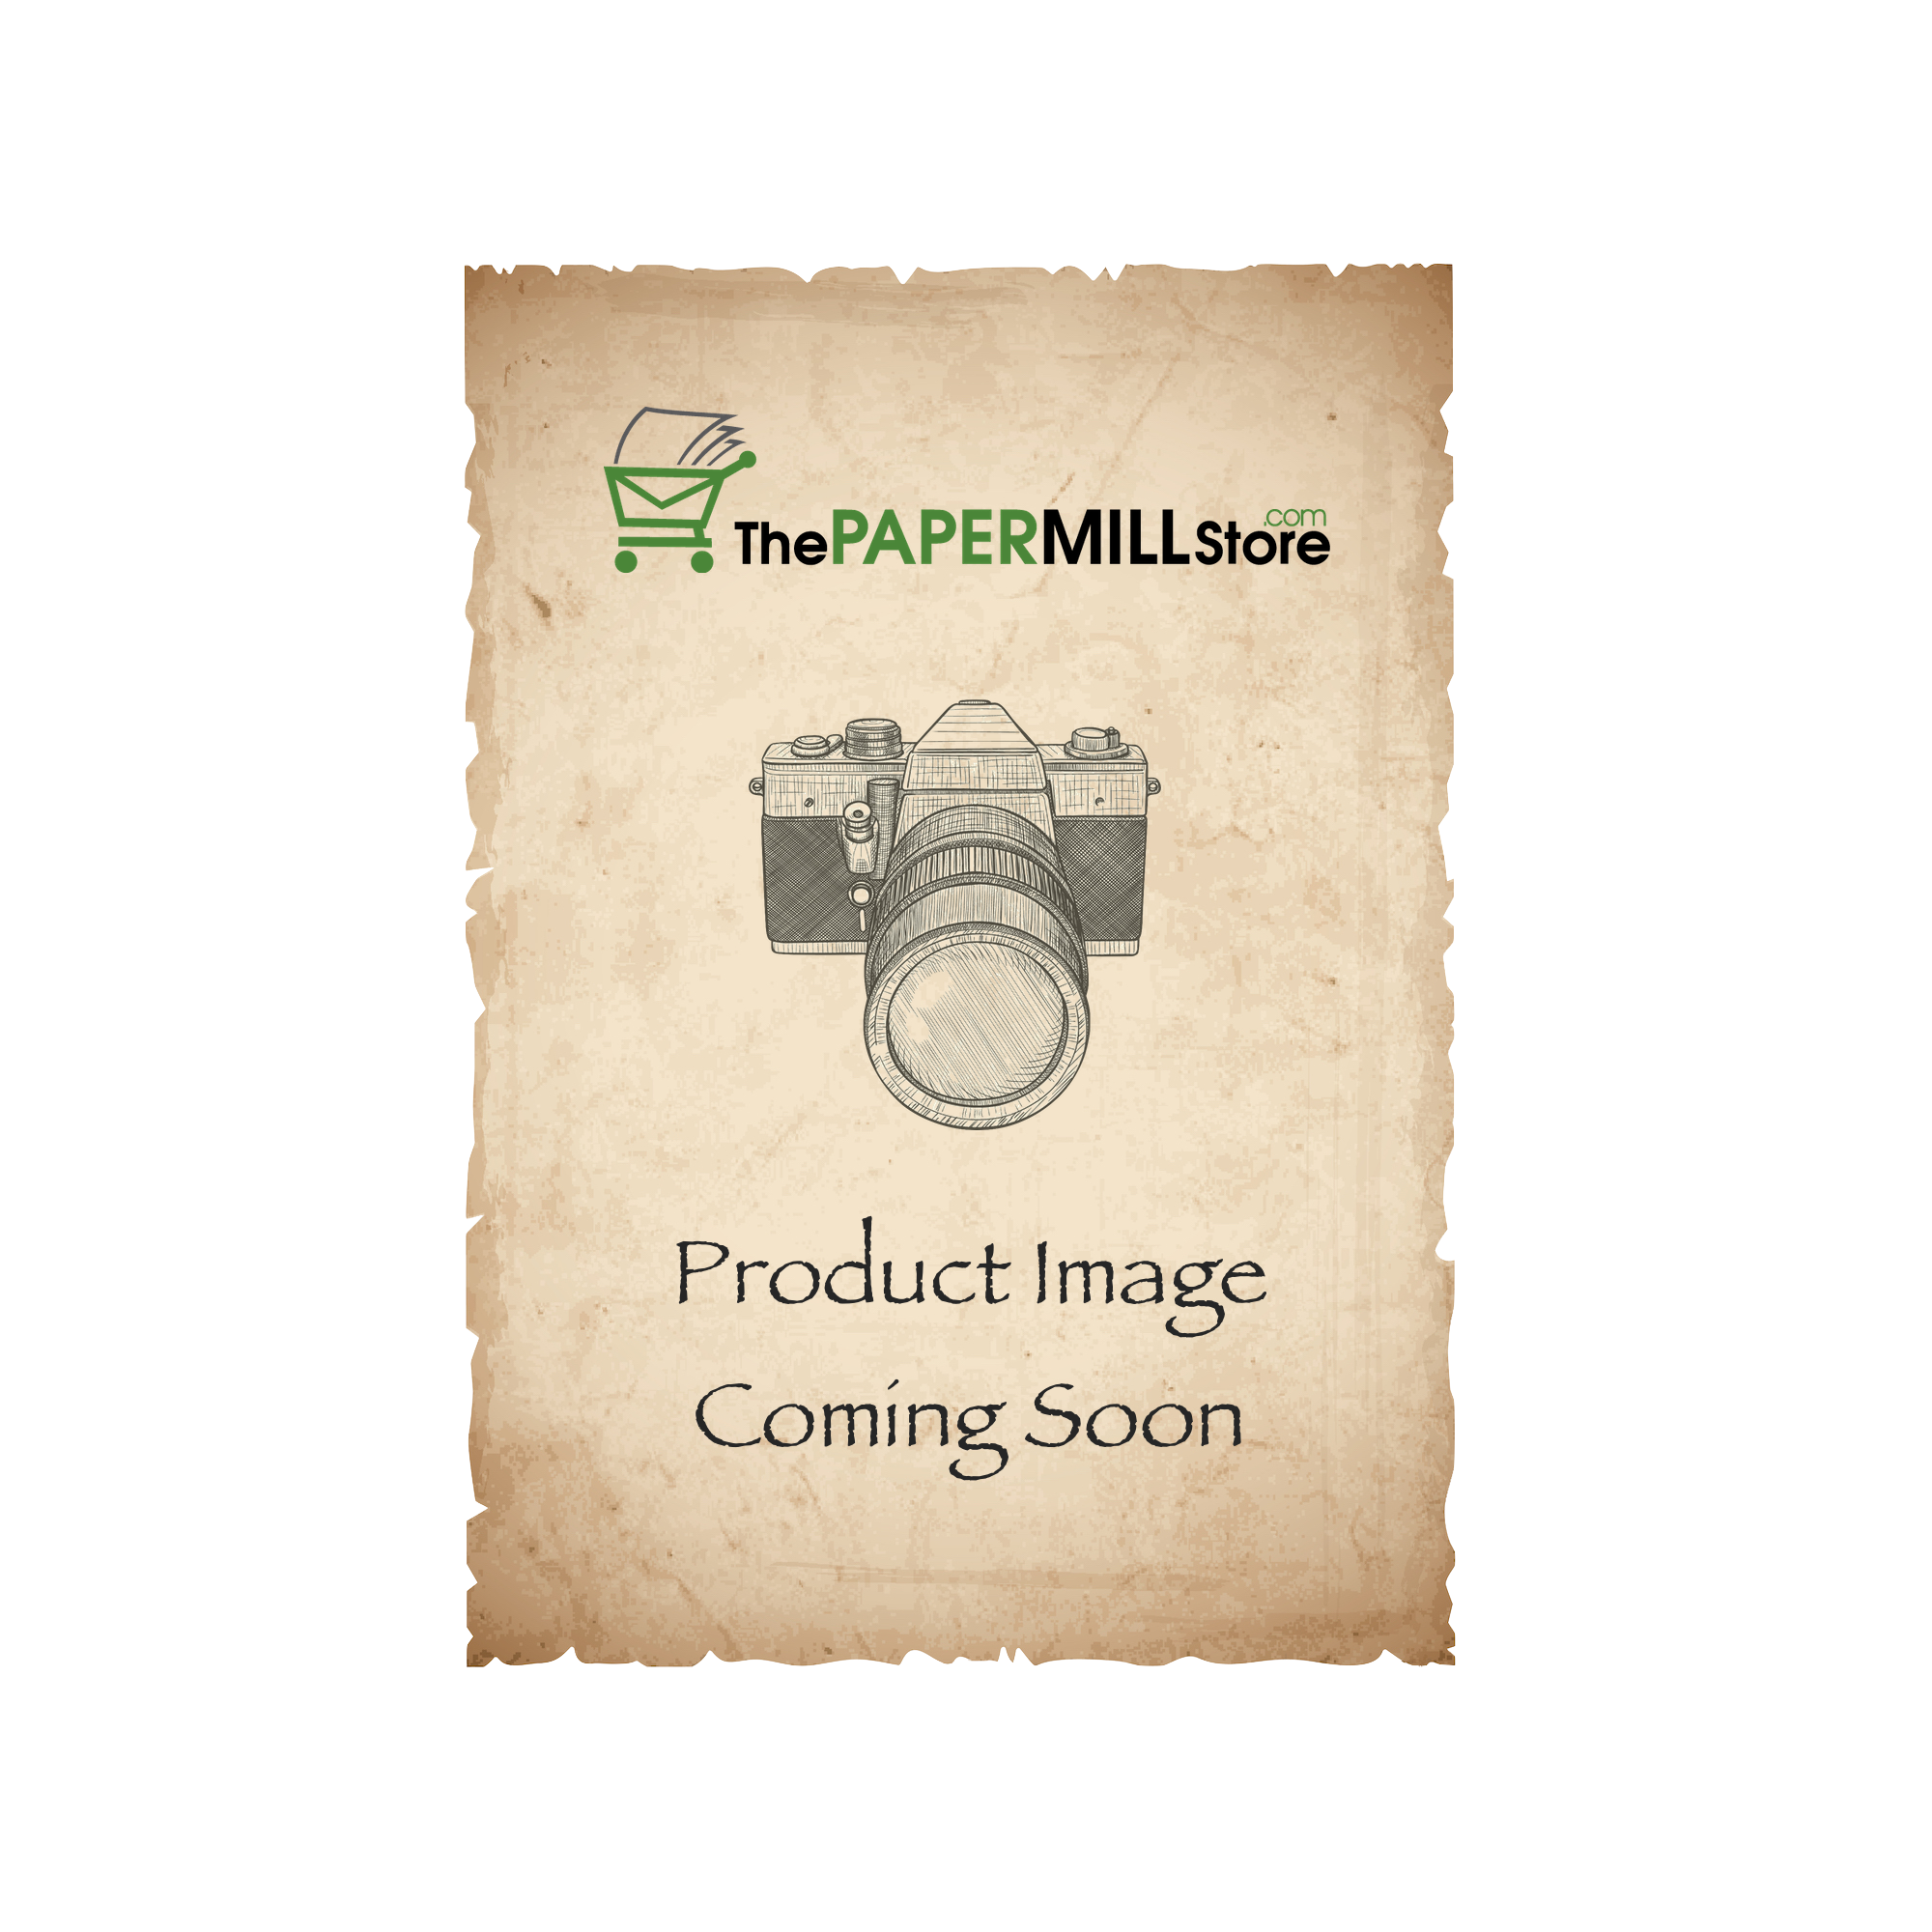 Ultrafelt Cool  White Paper - 26 x 40 in 80 lb Text Premium Felt  30% Recycled 750 per Carton